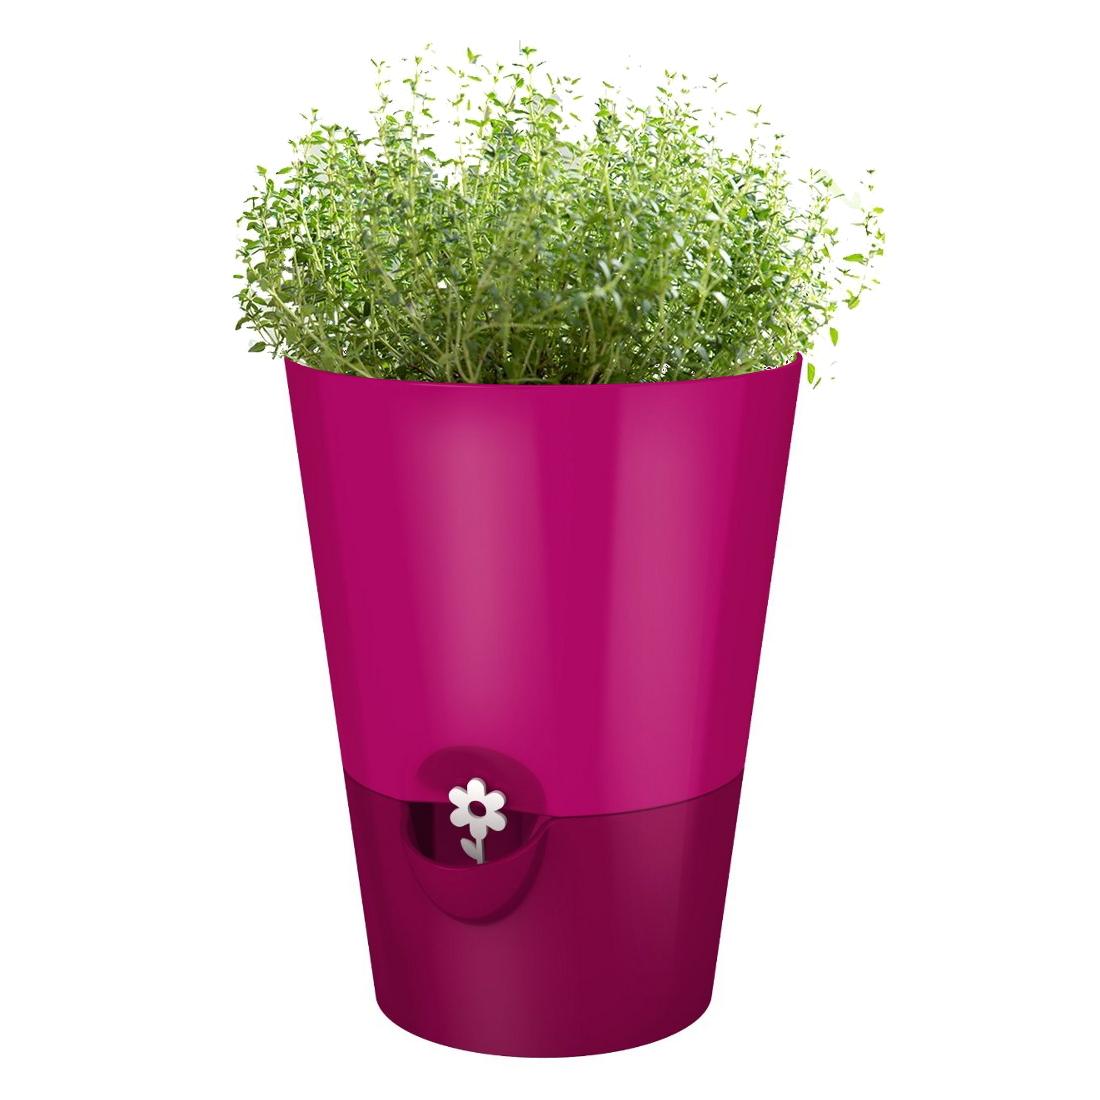 Emsa Smart Planter Pink 6.5 Inch Herb Grower